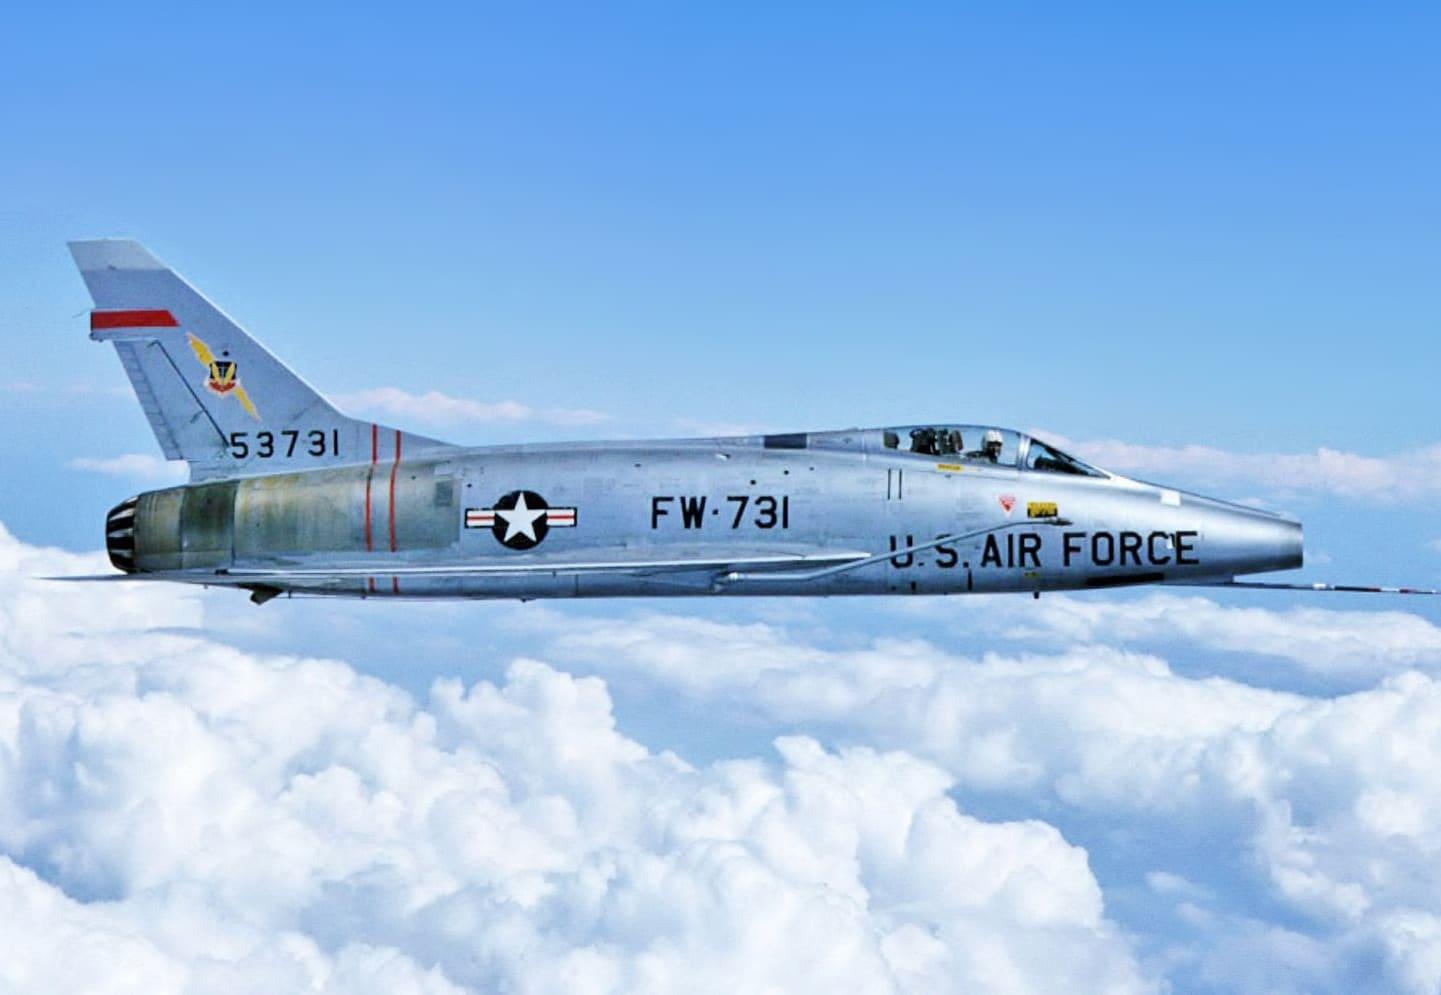 aircraft,F100D,F100,Super,Sabre,attack,Intercept,Bomber,fighter,military,WARBIRD